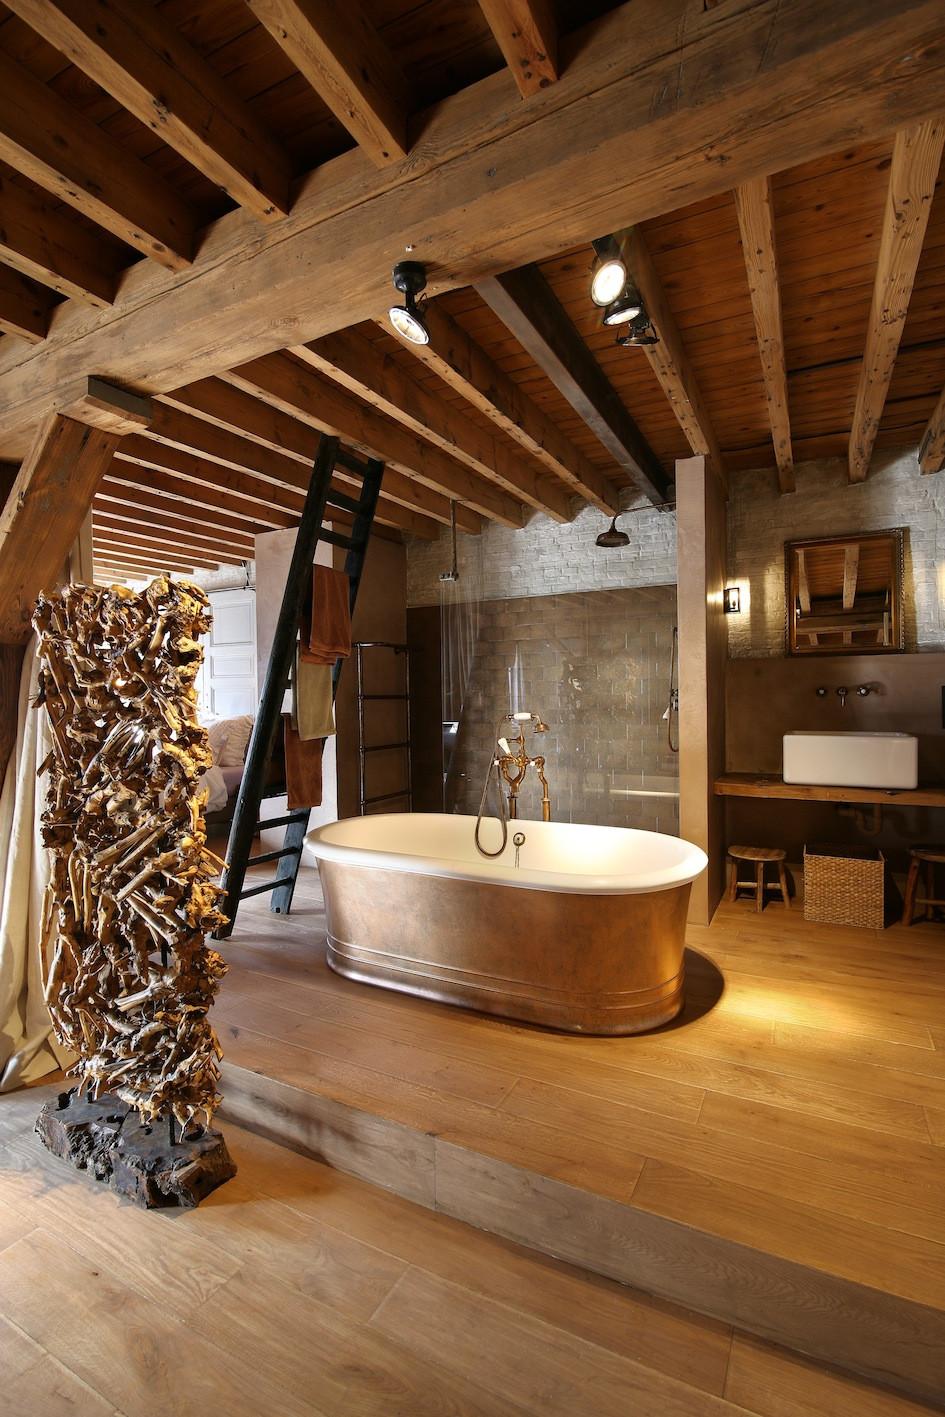 Dauby Taps & Baths badkamer